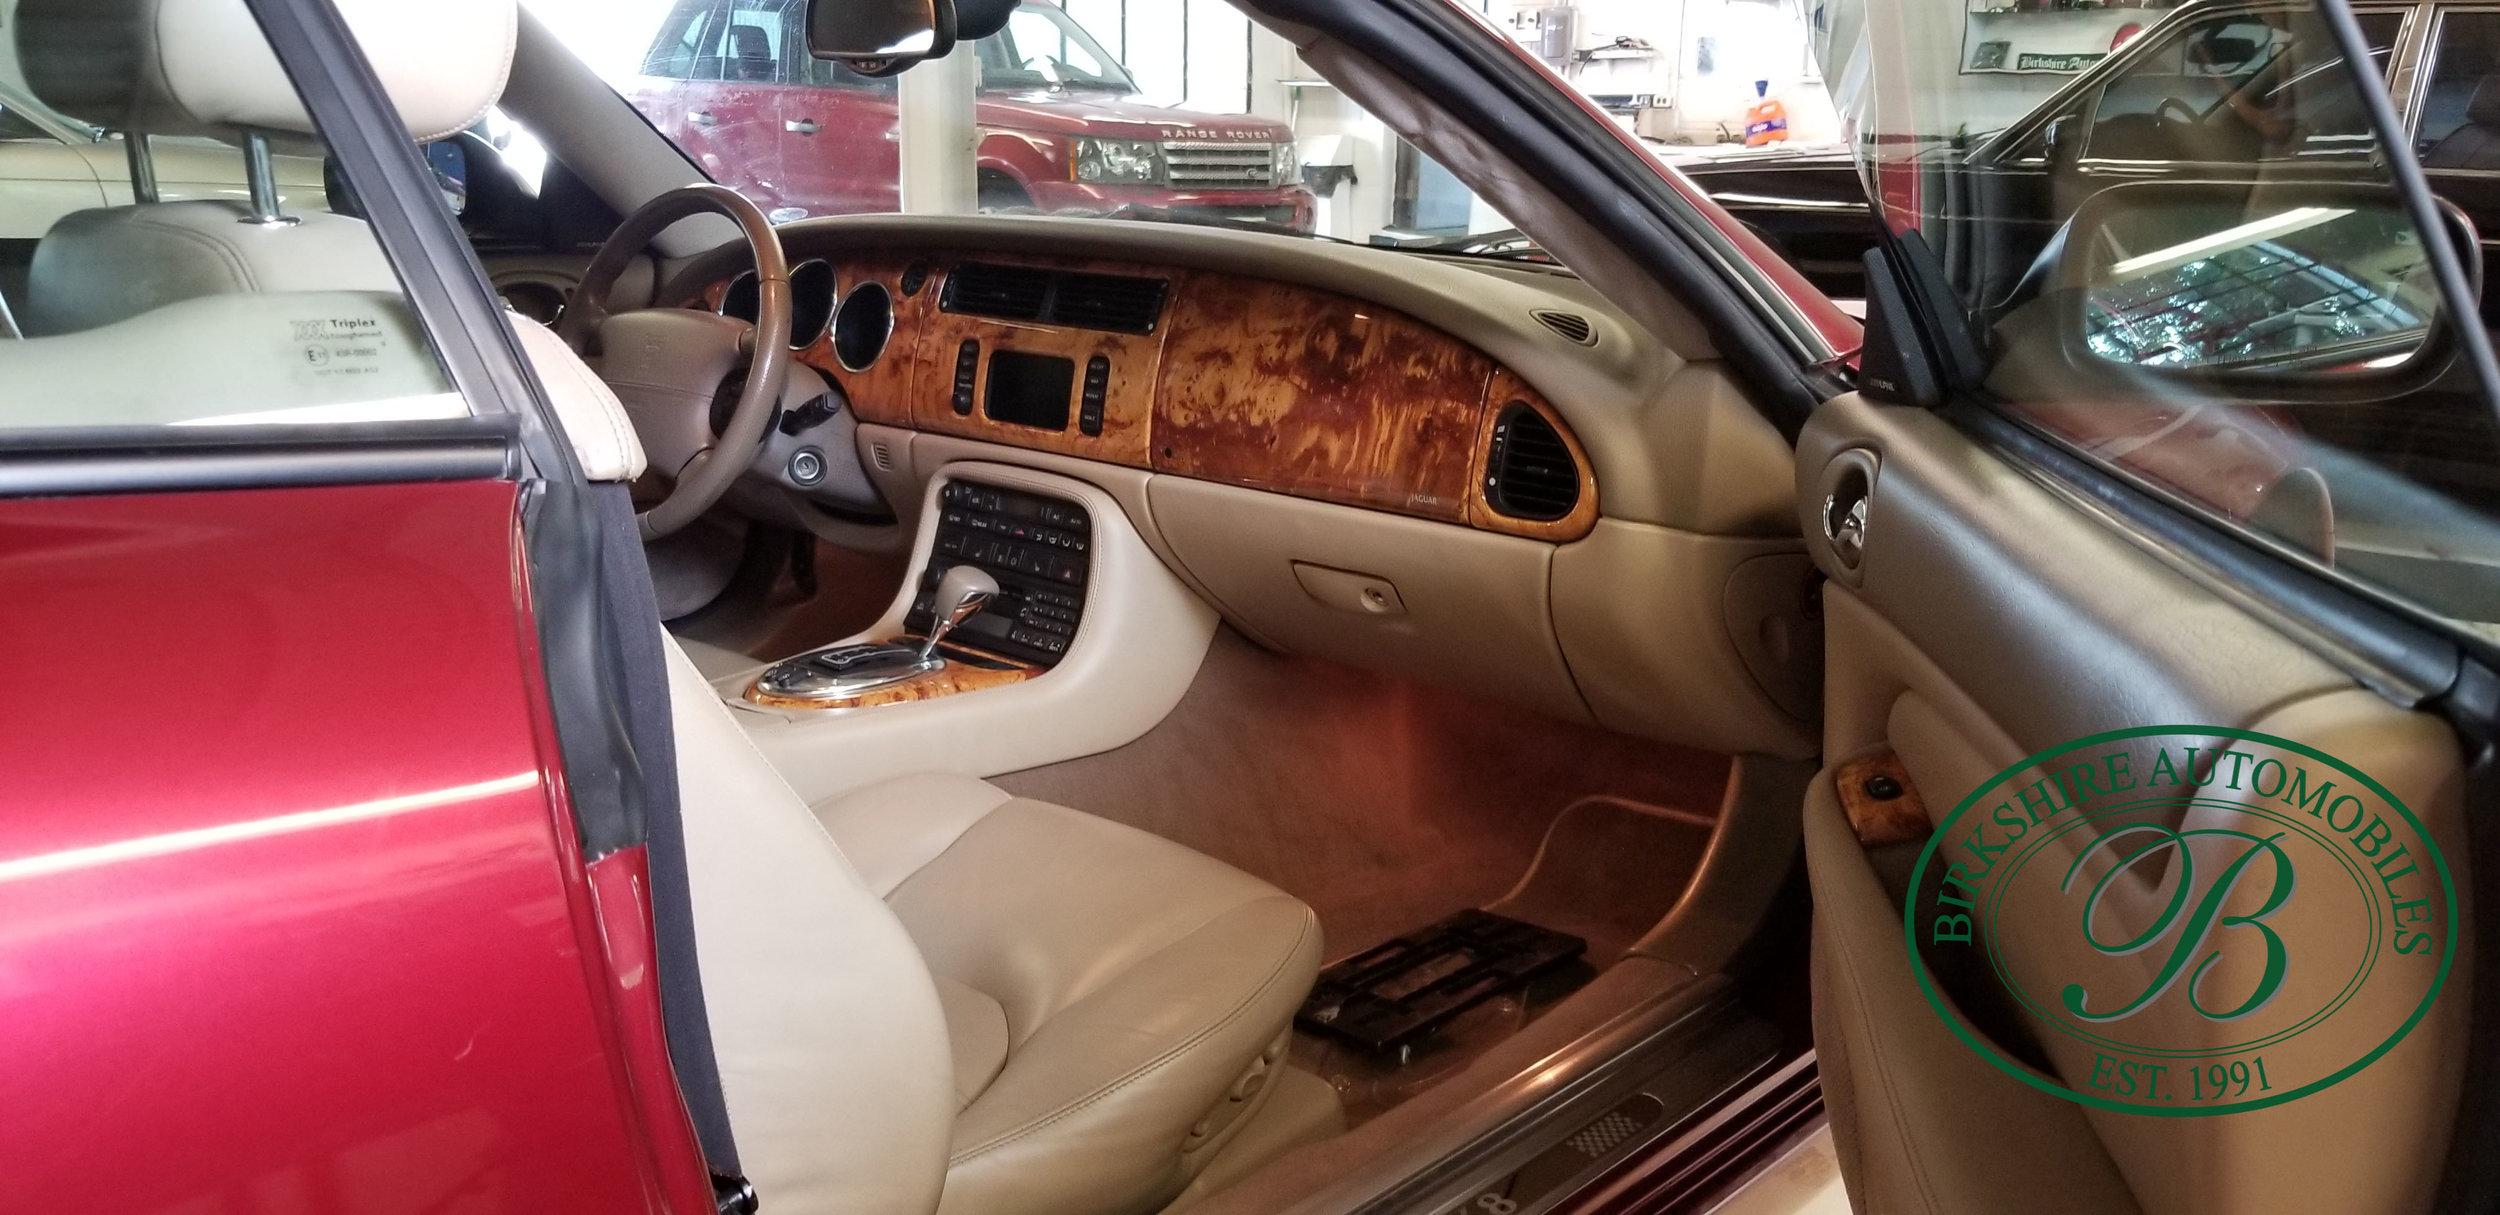 2006 Jaguar XK8 Convertible - Birkshire Automobiles Thornhill (5).jpg